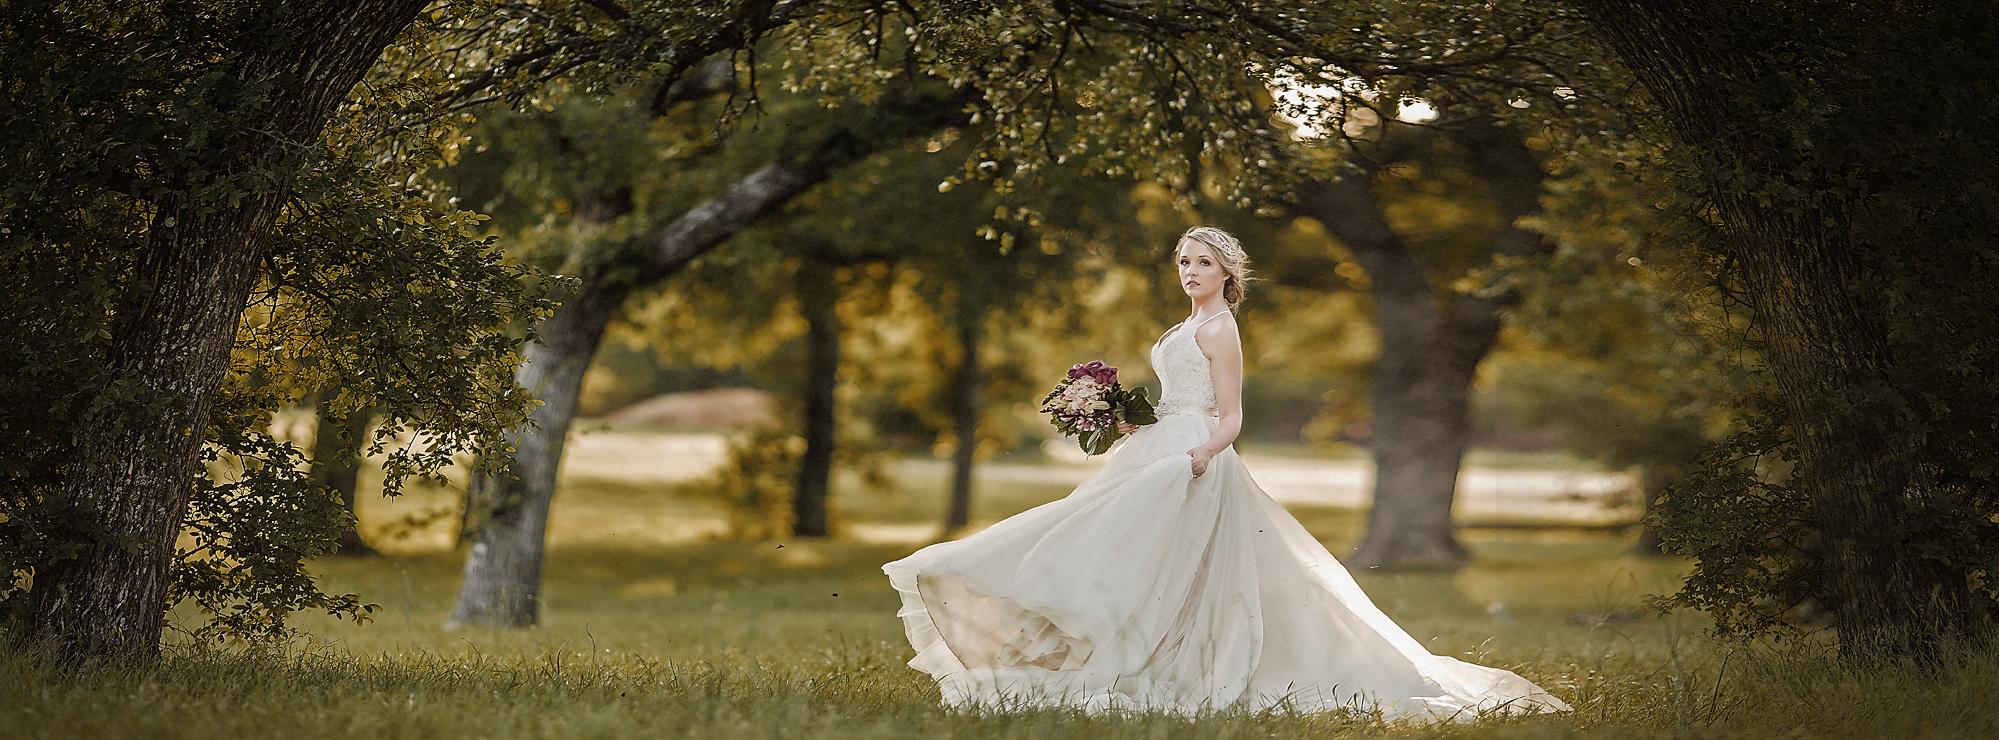 Copy of Dallas_Wedding_Photographer_Bridal_Portrait_Flower_Mound_Photographer_Kate_Marie_Portraiture_2